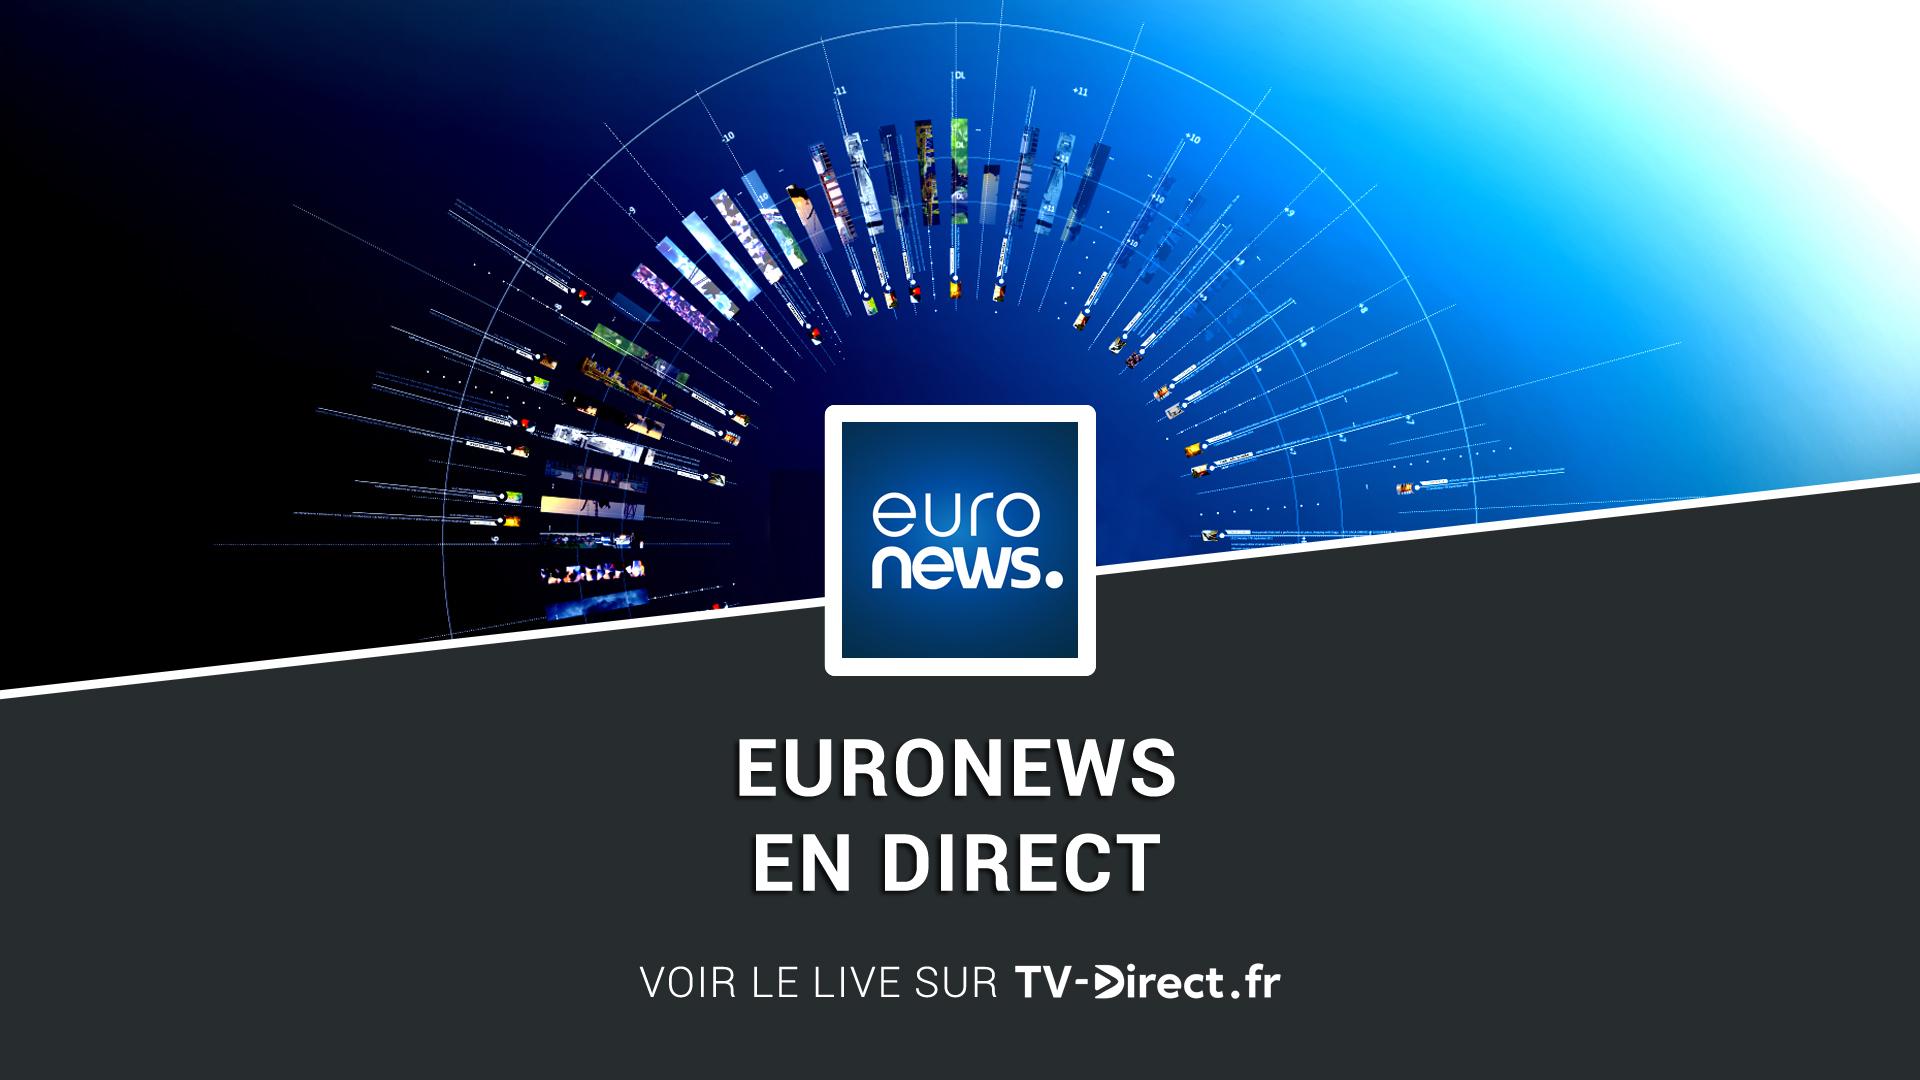 euronews france direct regarder euronews france live sur